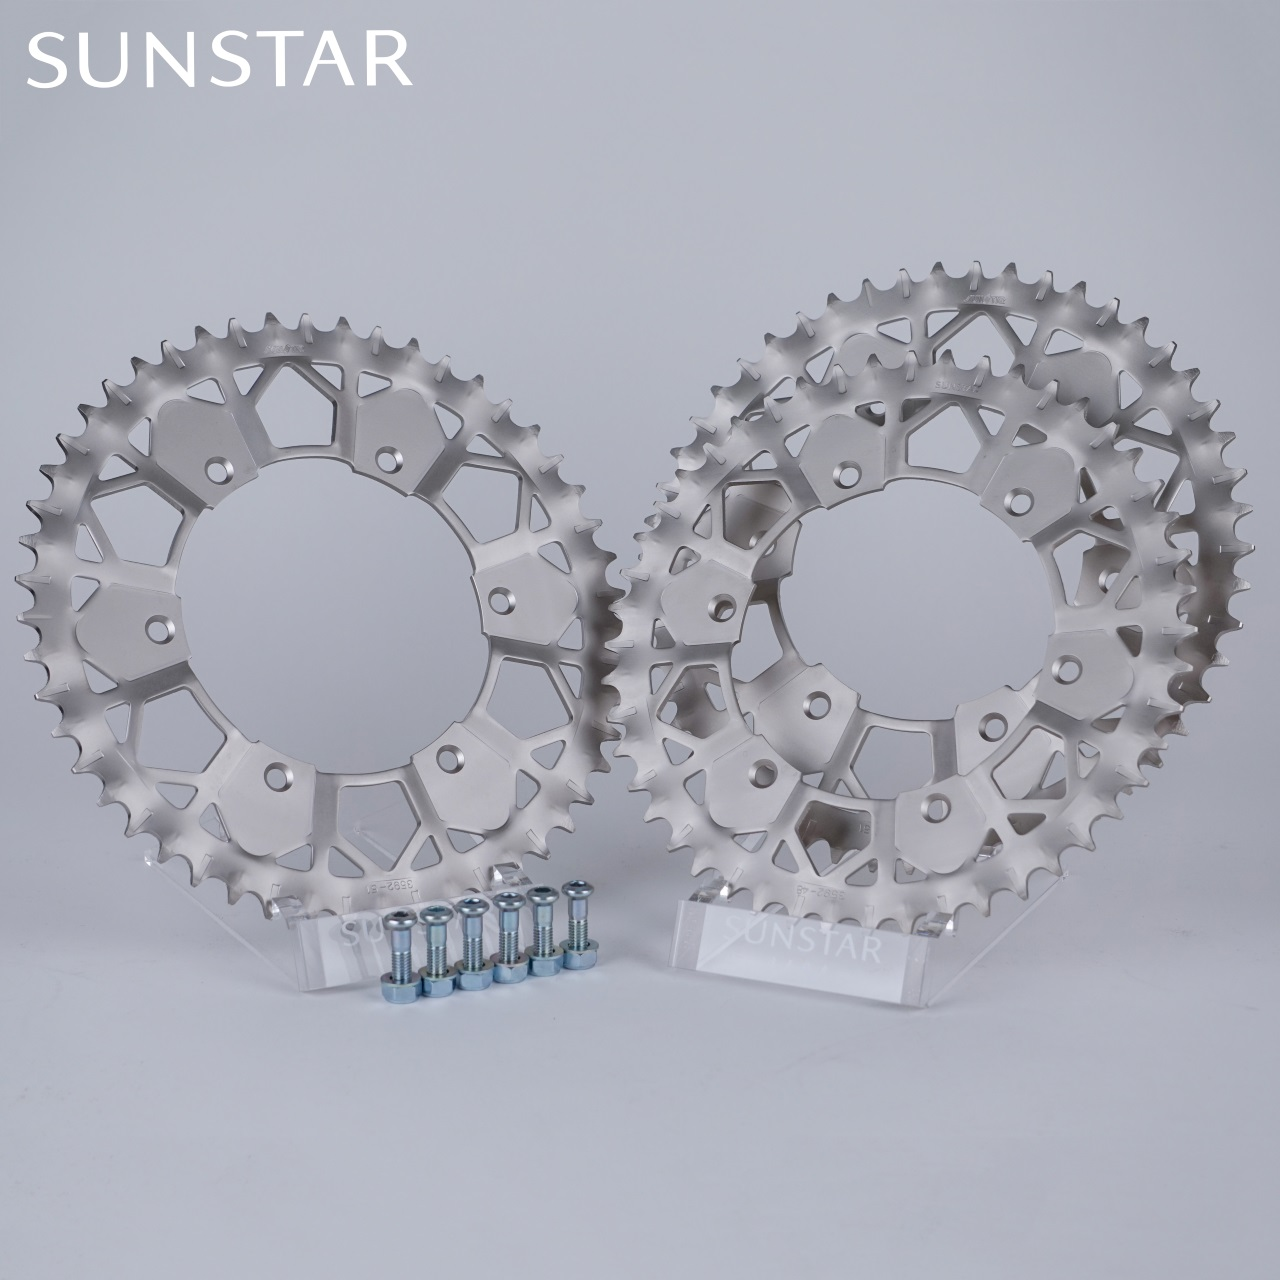 【SUNSTAR】STENZ 越野型後齒盤 - 「Webike-摩托百貨」